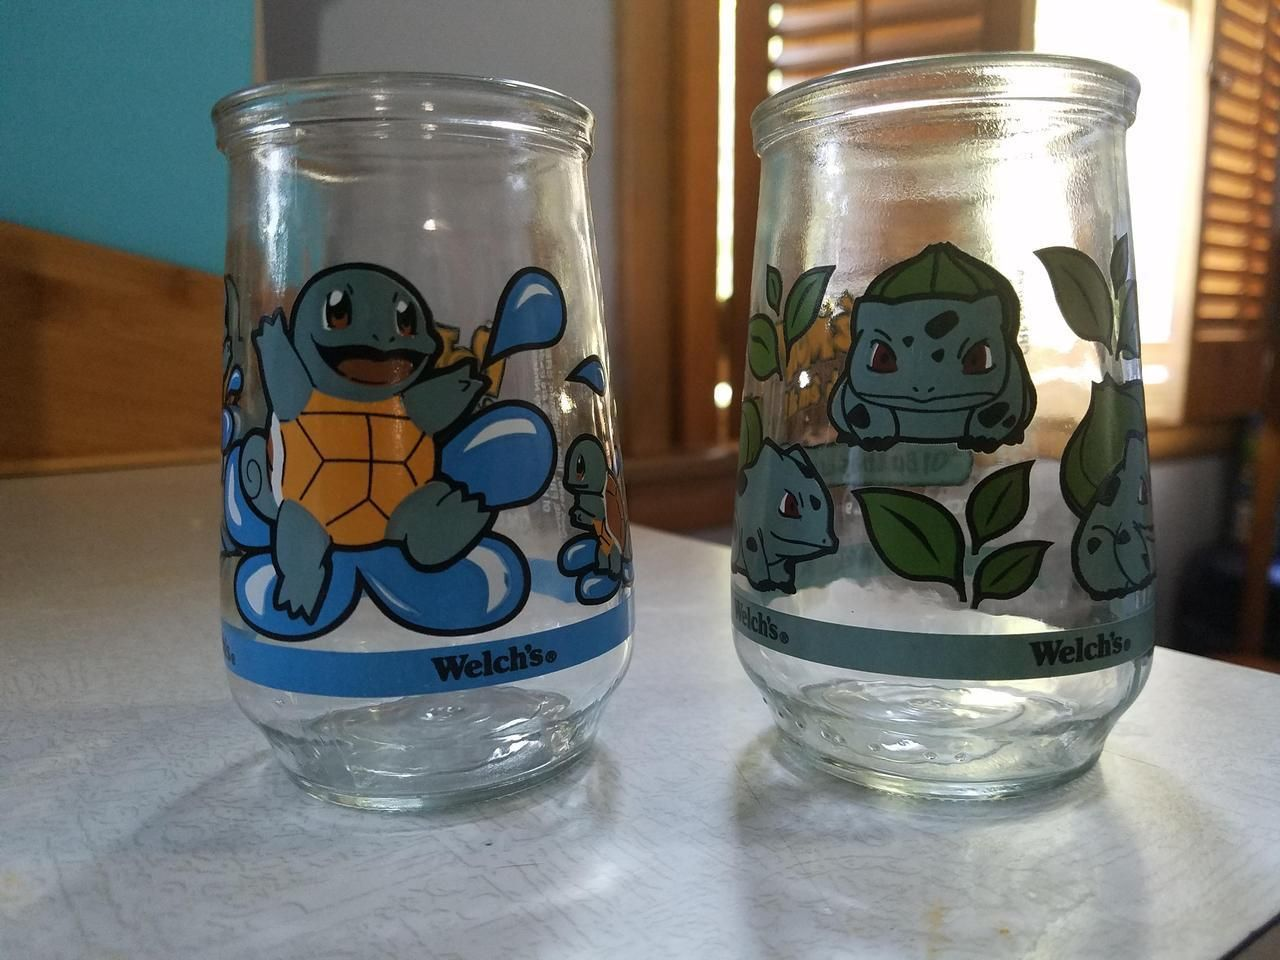 Pokemon Welsh's Jelly Glasses from 1998 -